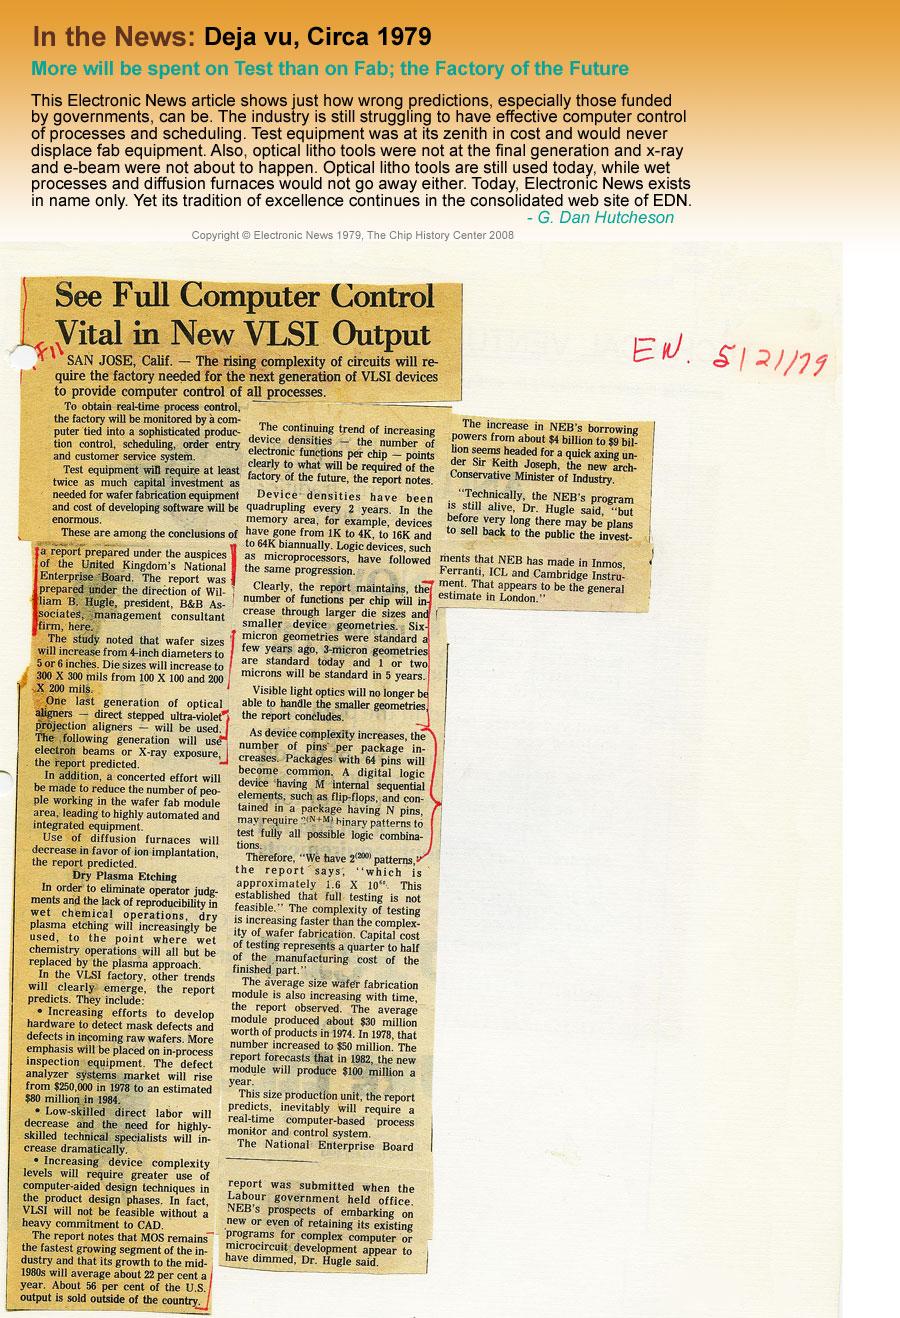 In the News: Deja vu, Circa 1979